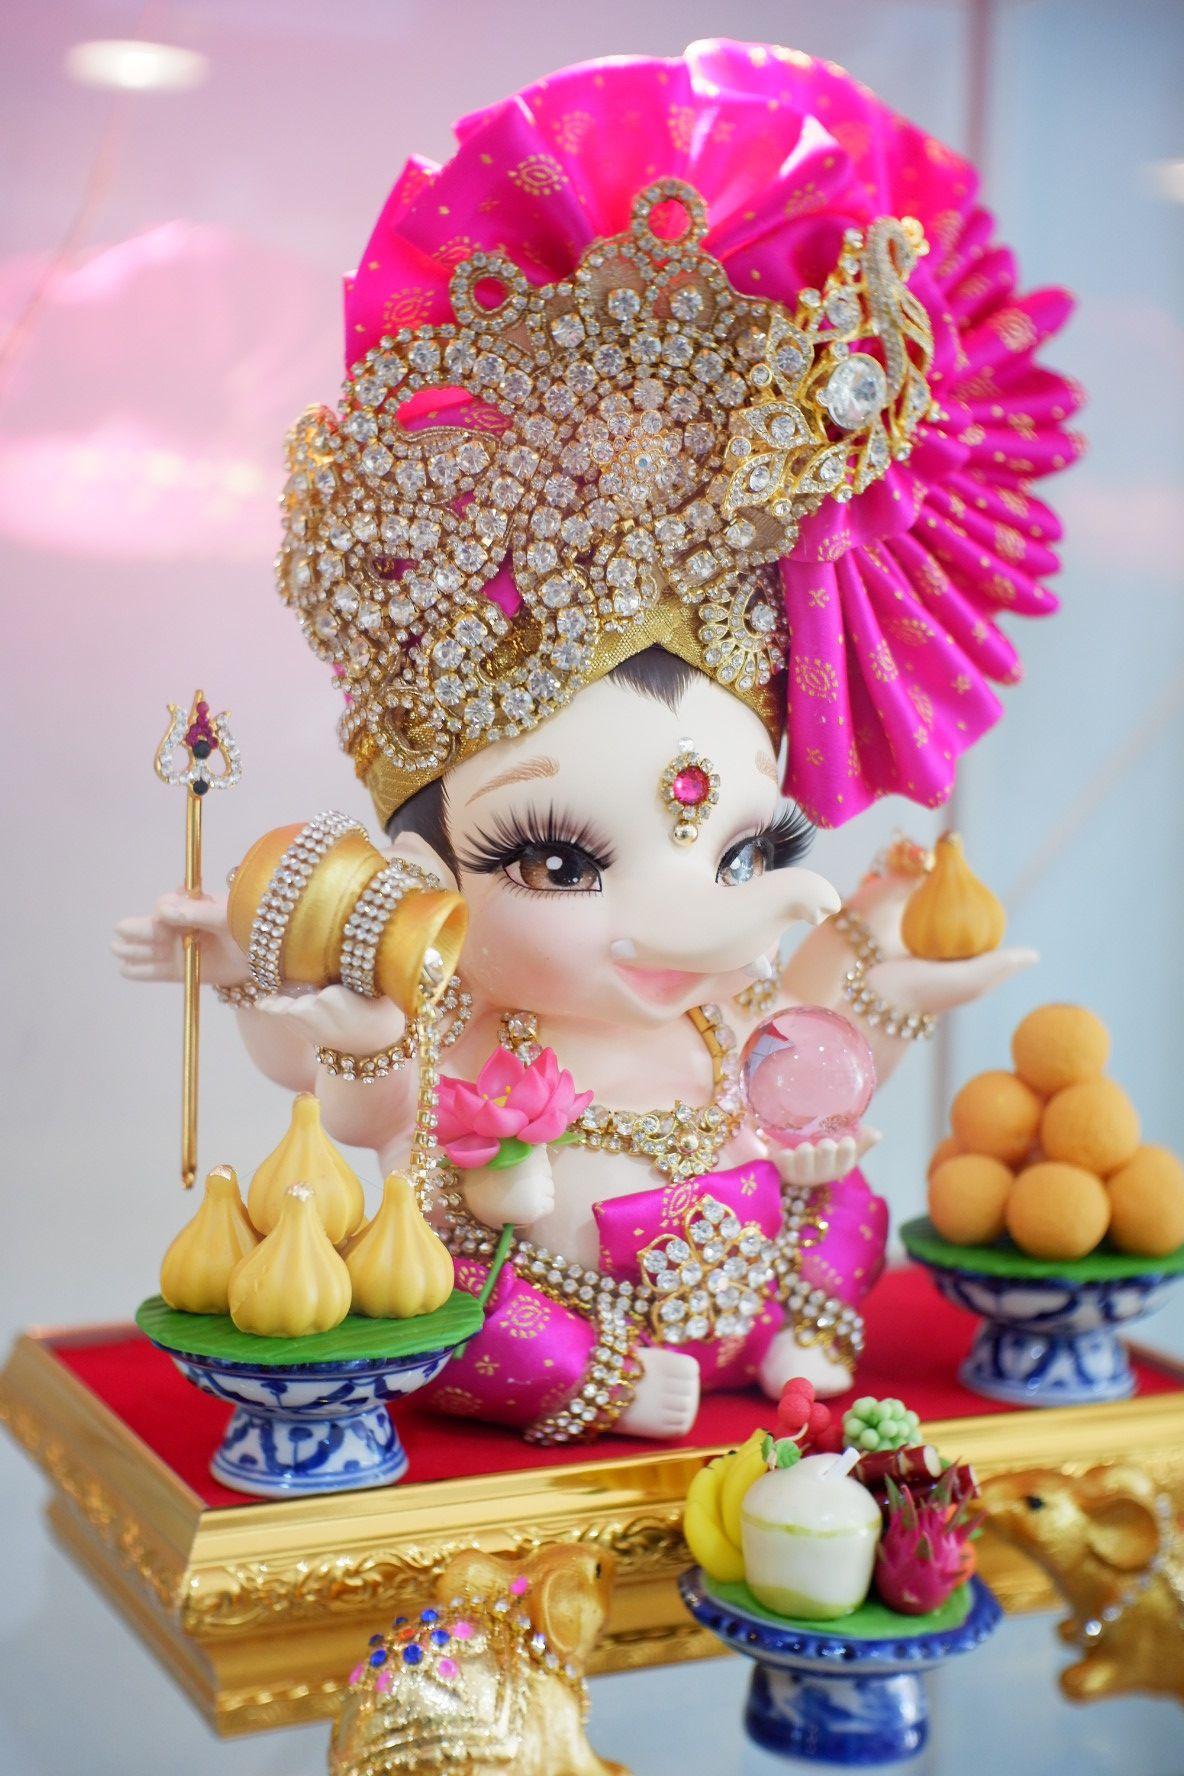 50 Best Cute Lord Ganesh Images Ganesh Ganesh Images Lord Ganesha Paintings